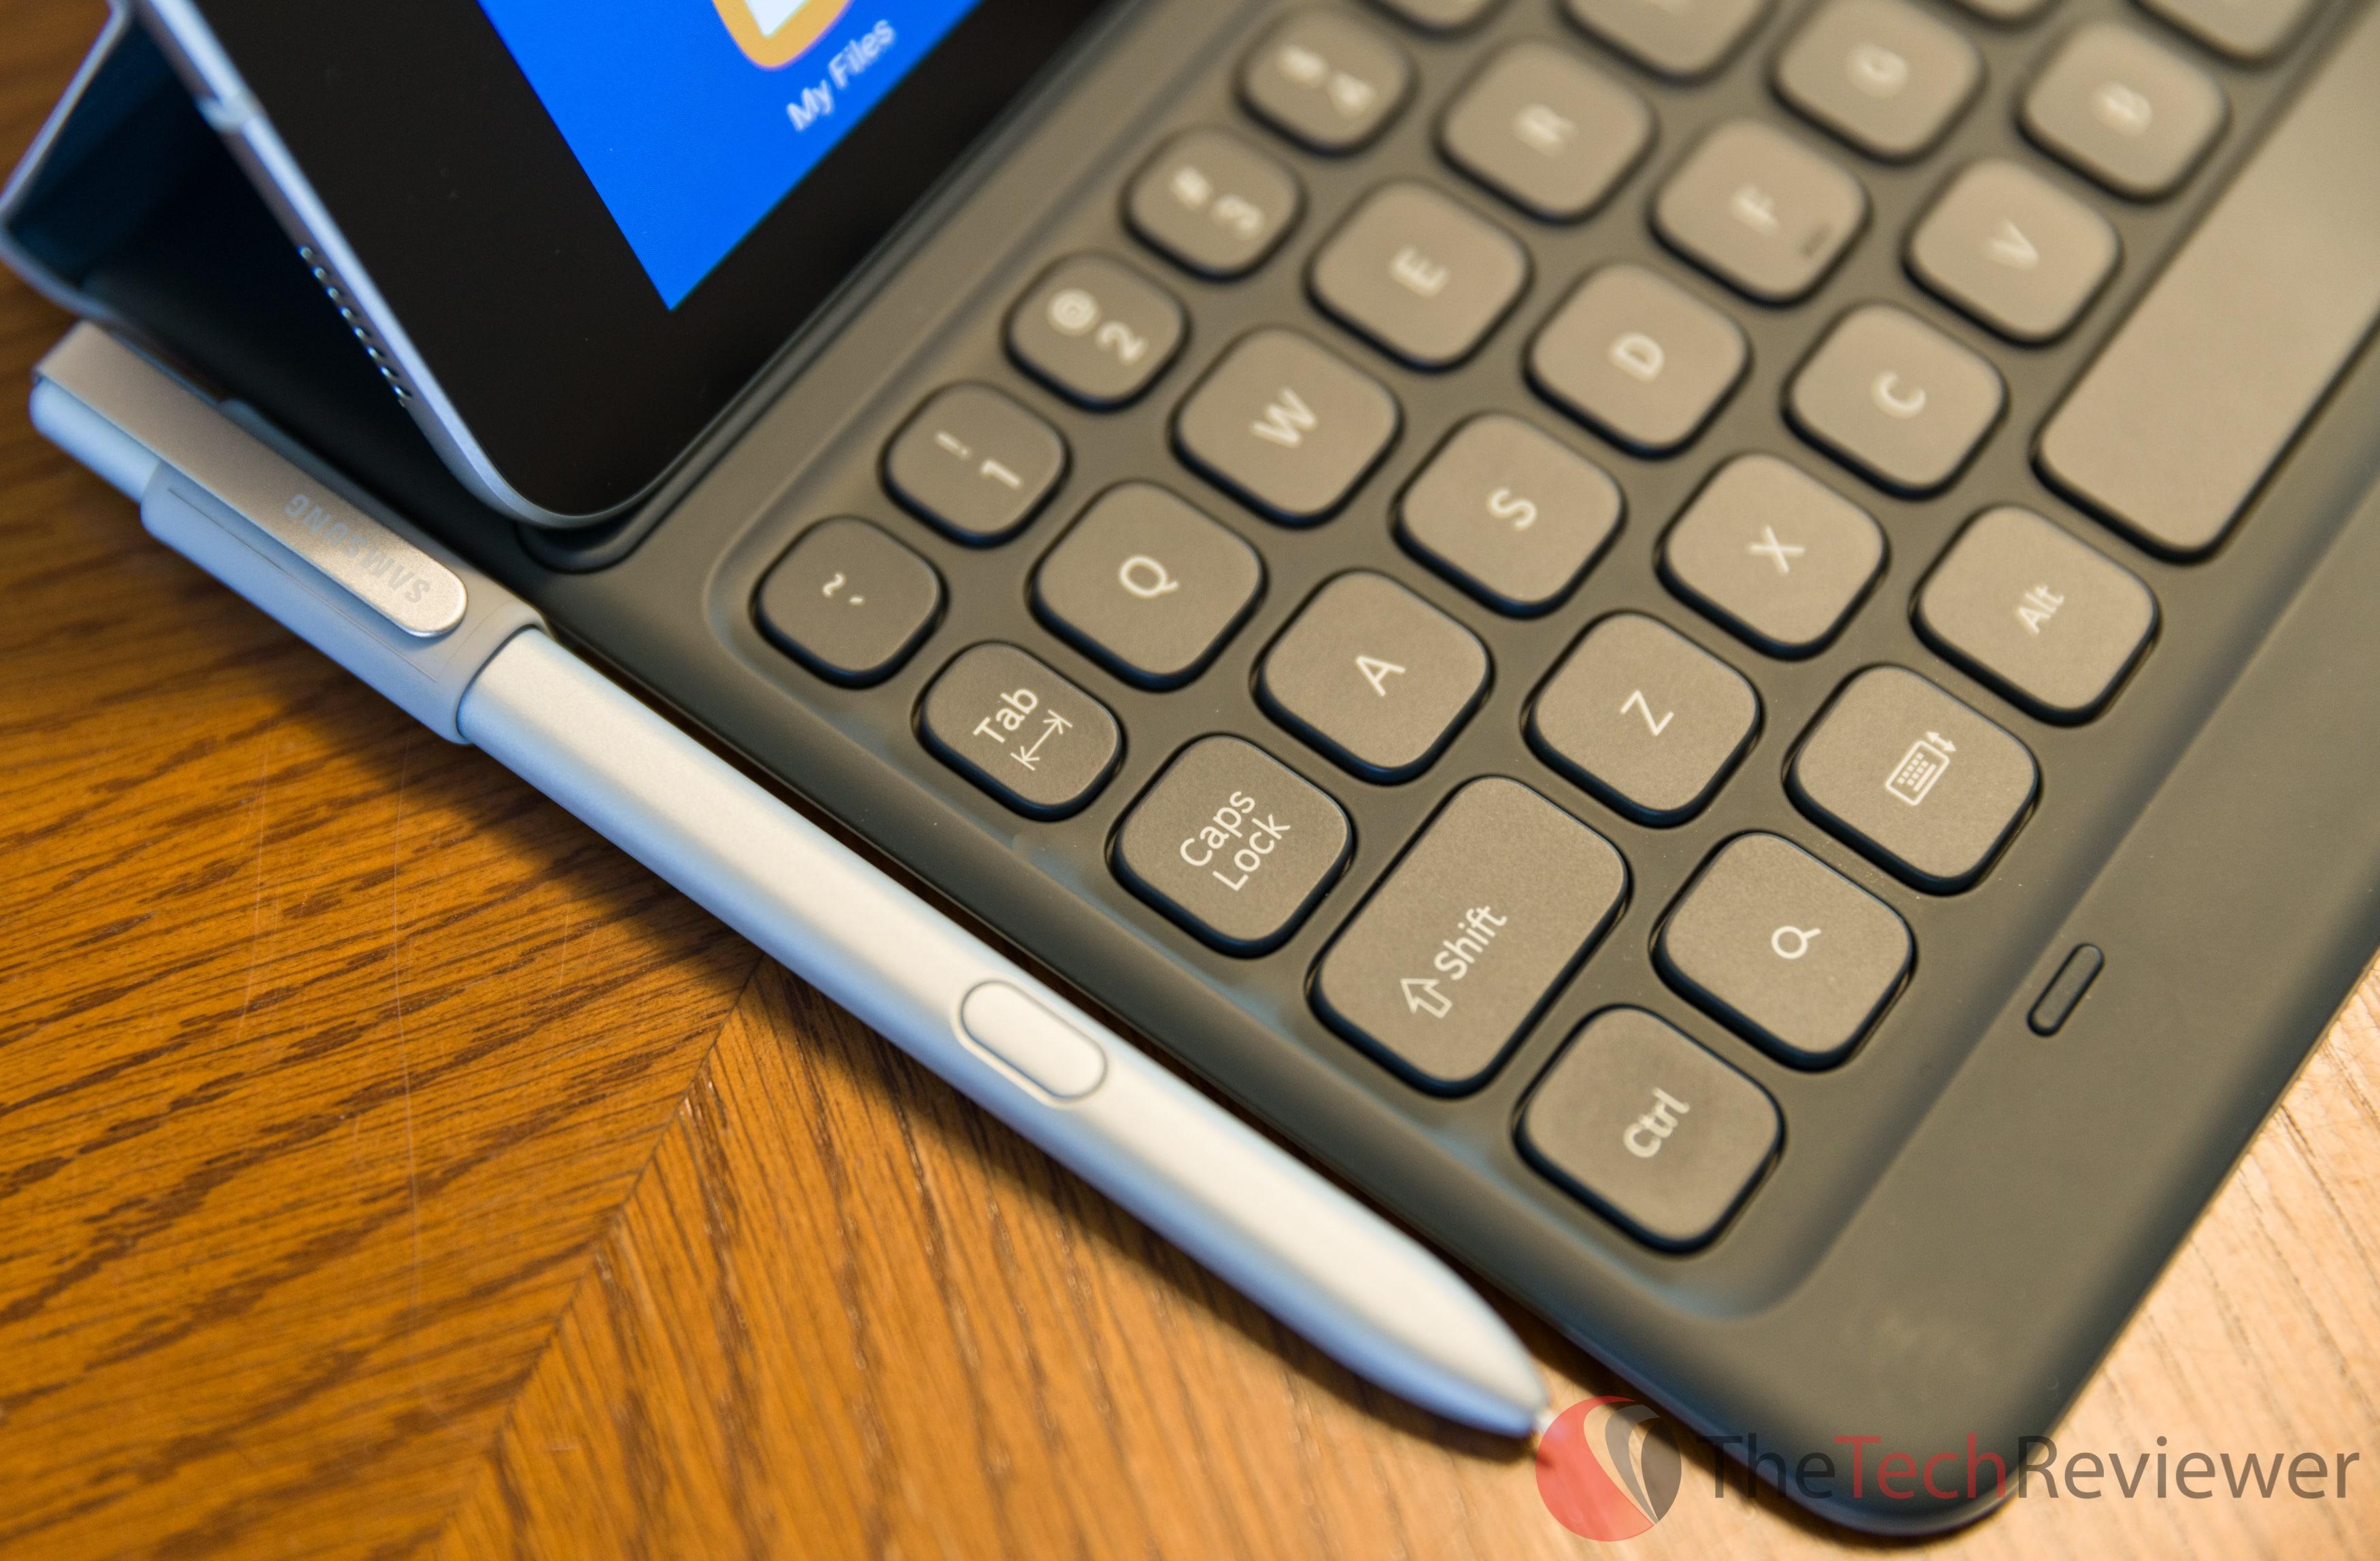 Samsung Galaxy Tab S3 6 of 10